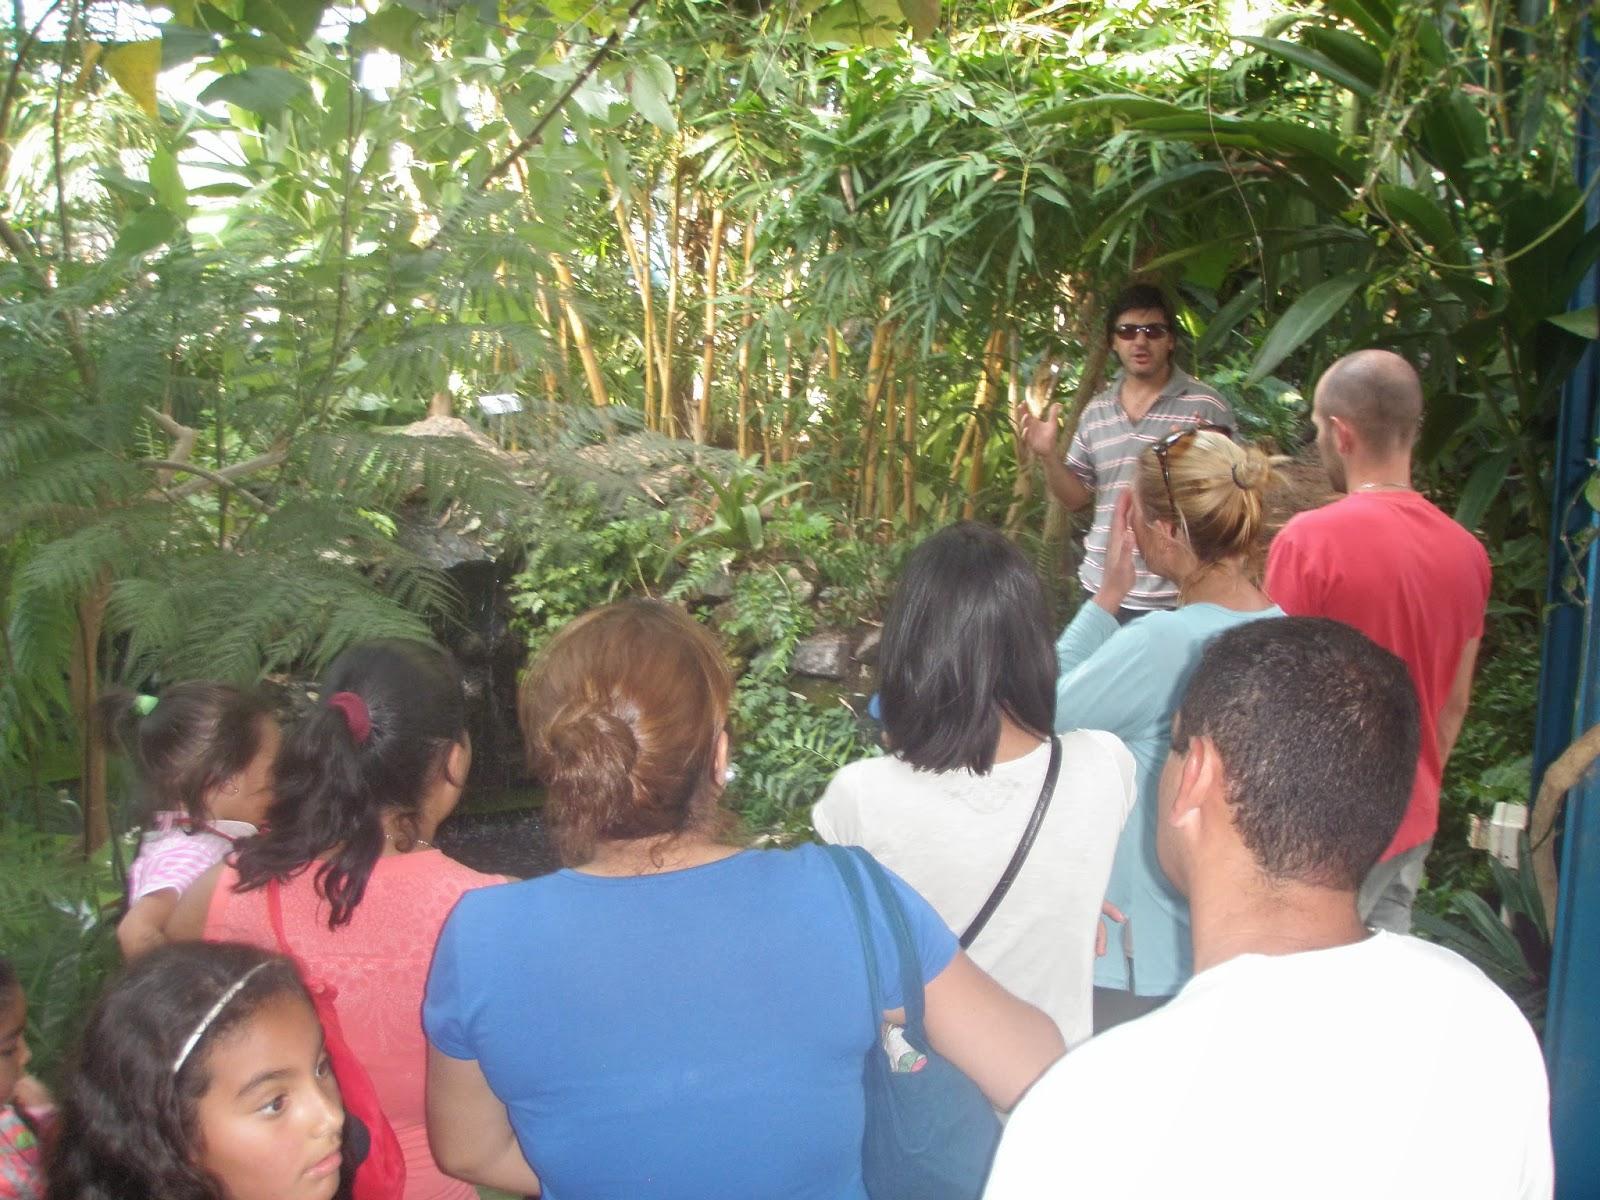 Jard n bot nico de c rdoba actividades 2013 for Actividades jardin botanico